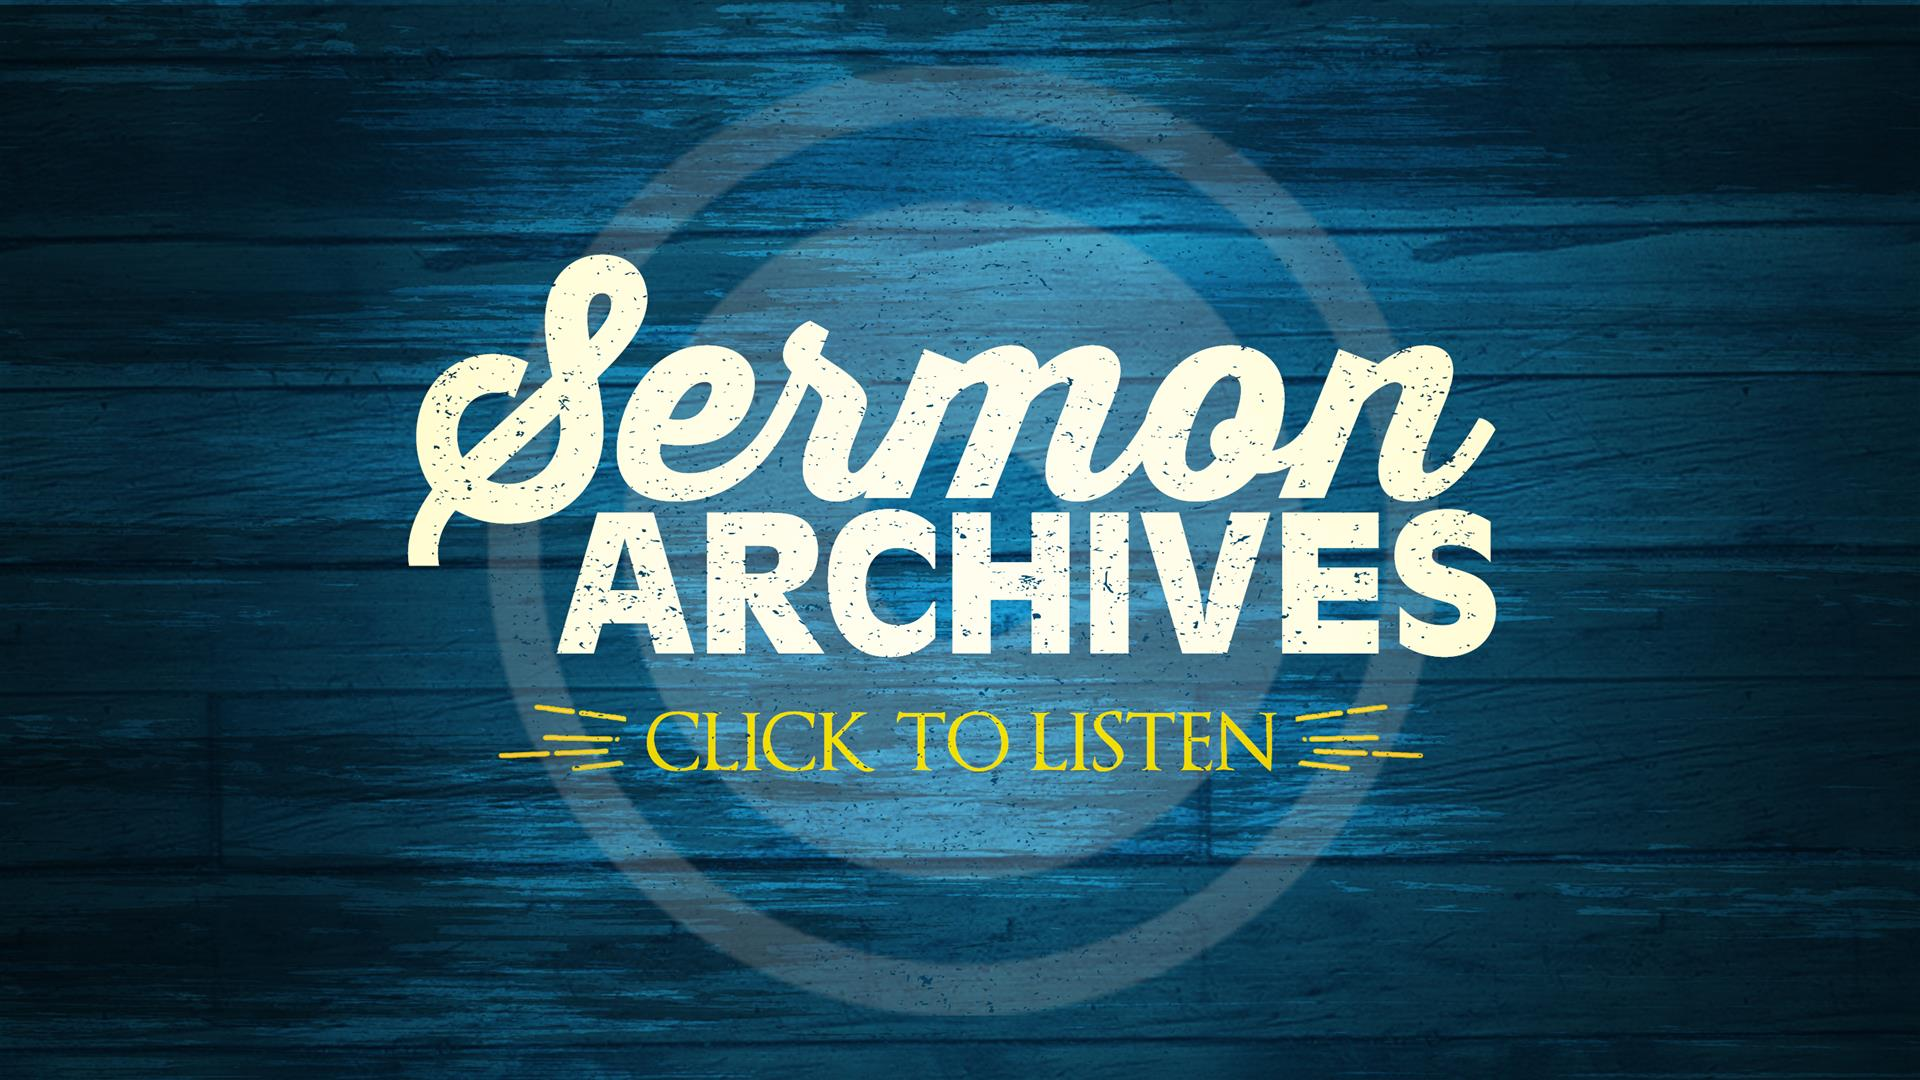 sermon archives.jpg